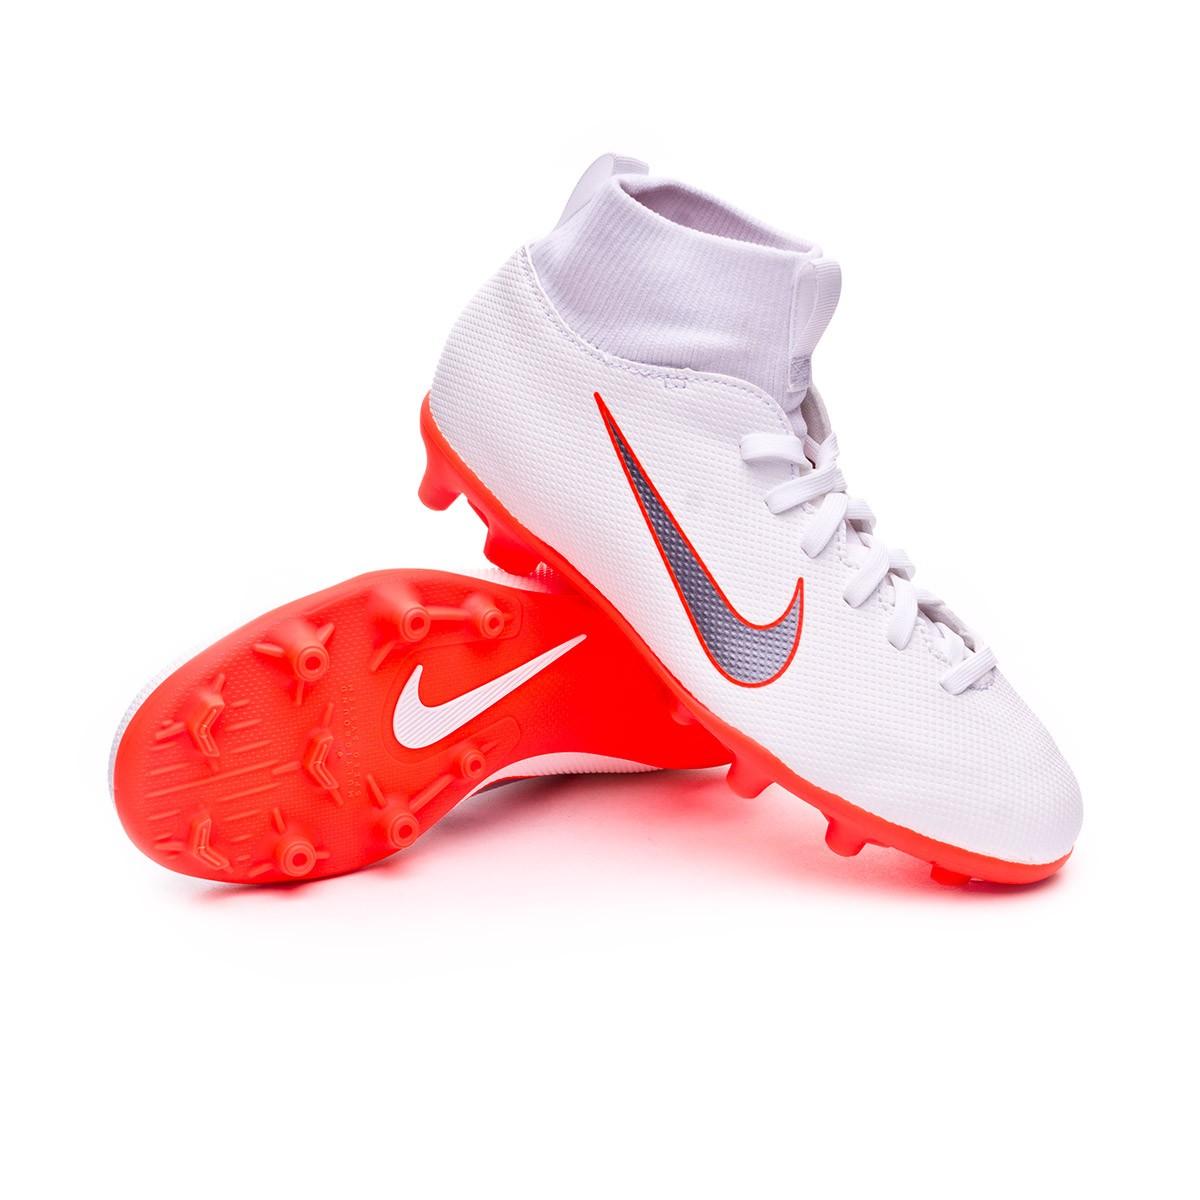 99557c165d7eb Football Boots Nike Kids Mercurial Superfly VI Club MG White ...